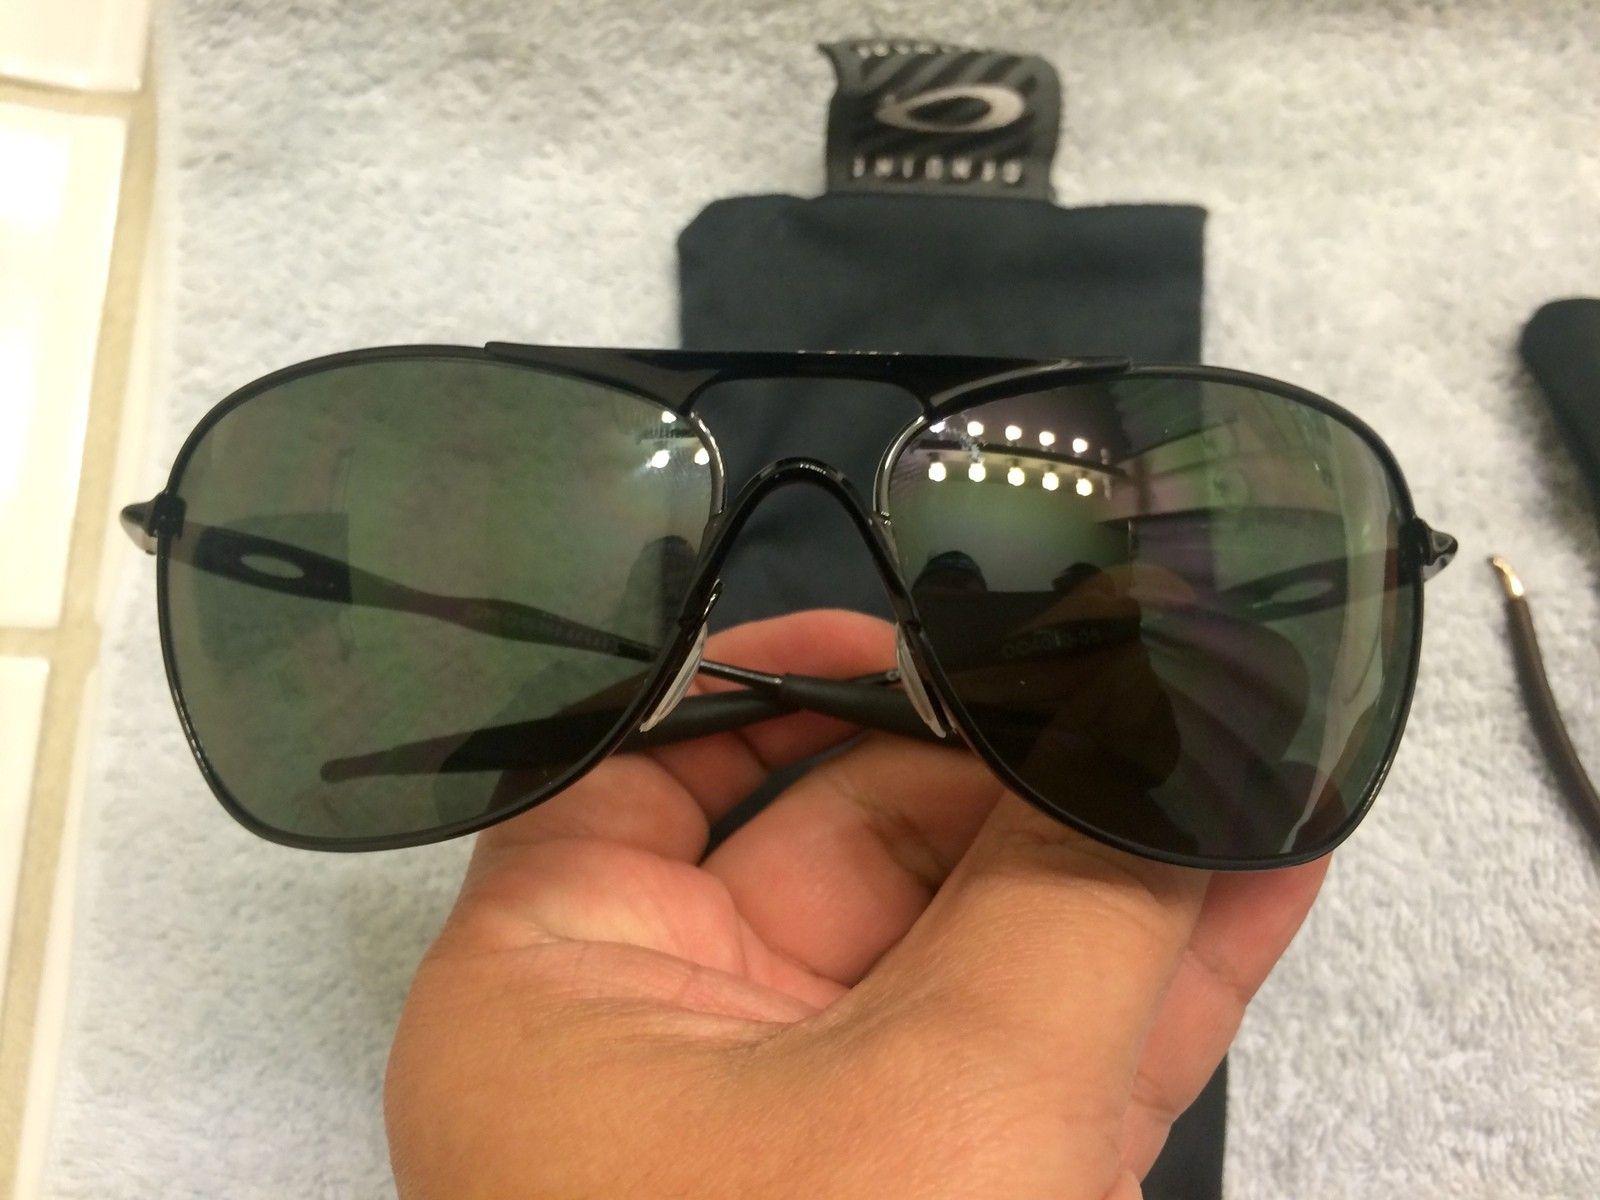 Crosshair 2012 - 2 pairs - under $99 - 2015-12-06 20.36.28.jpg